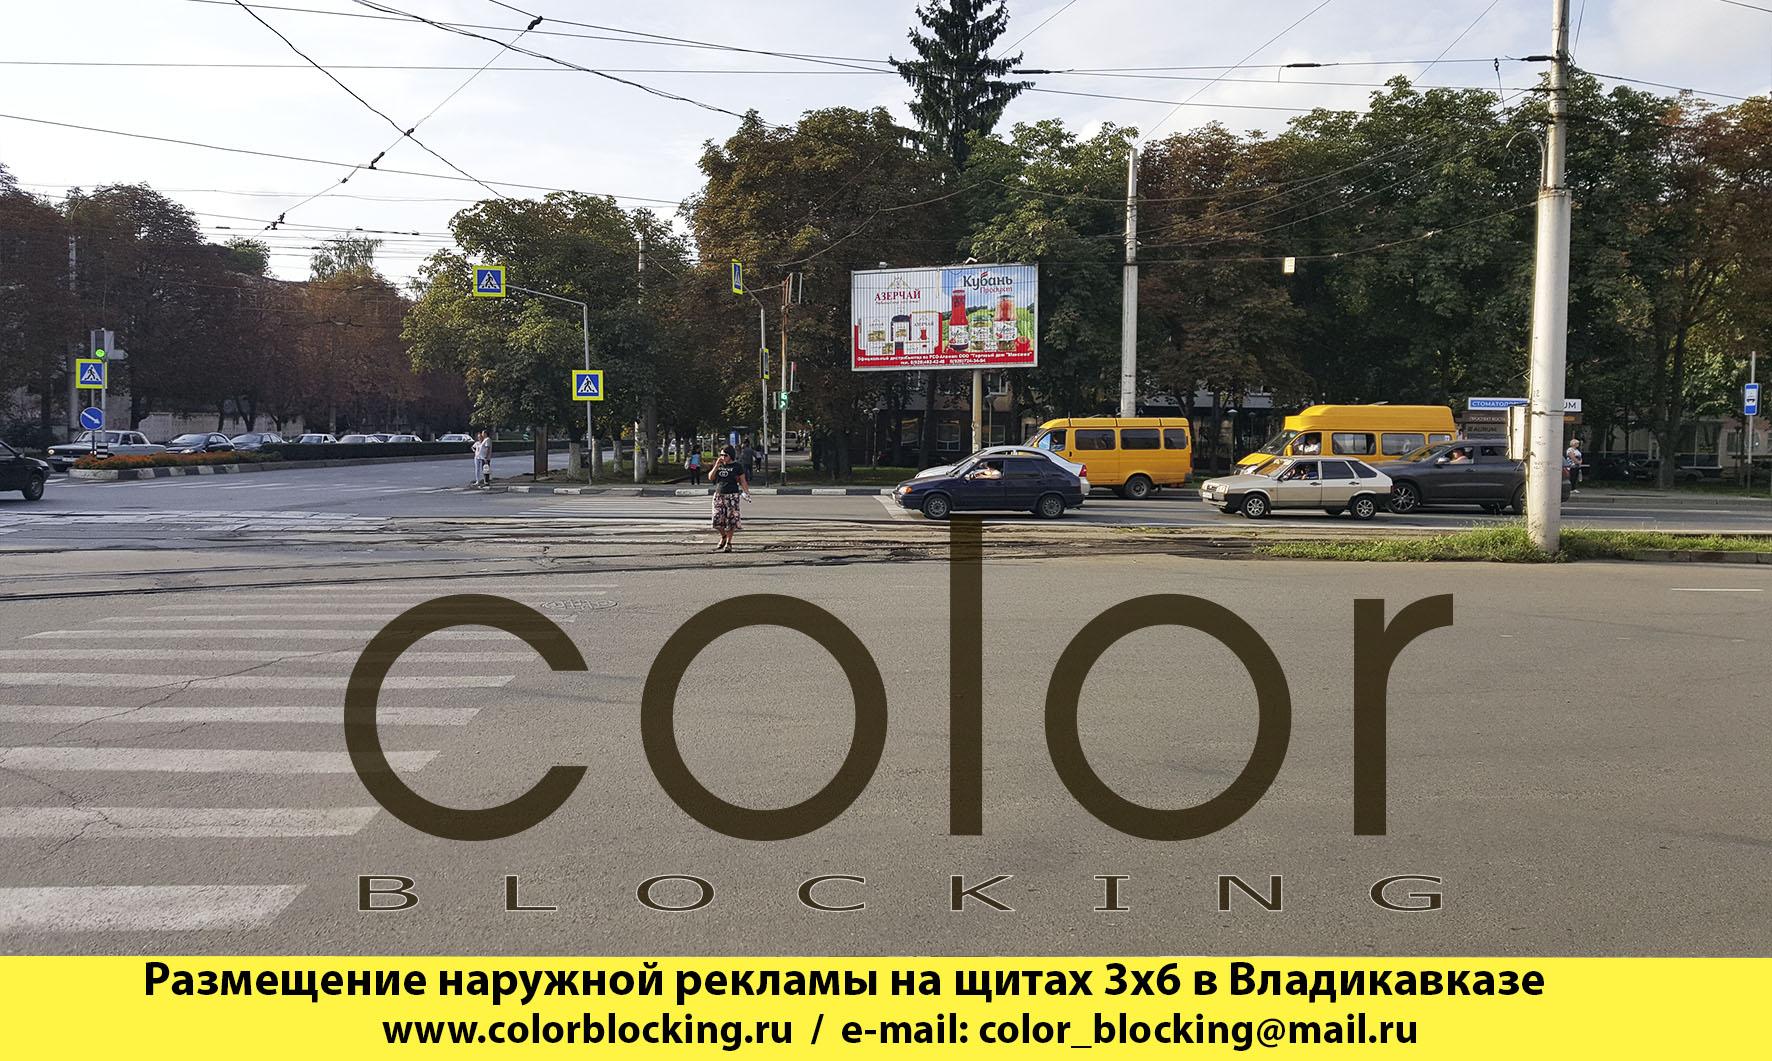 Реклама на щитах 3х6 в Владикавказе аренда